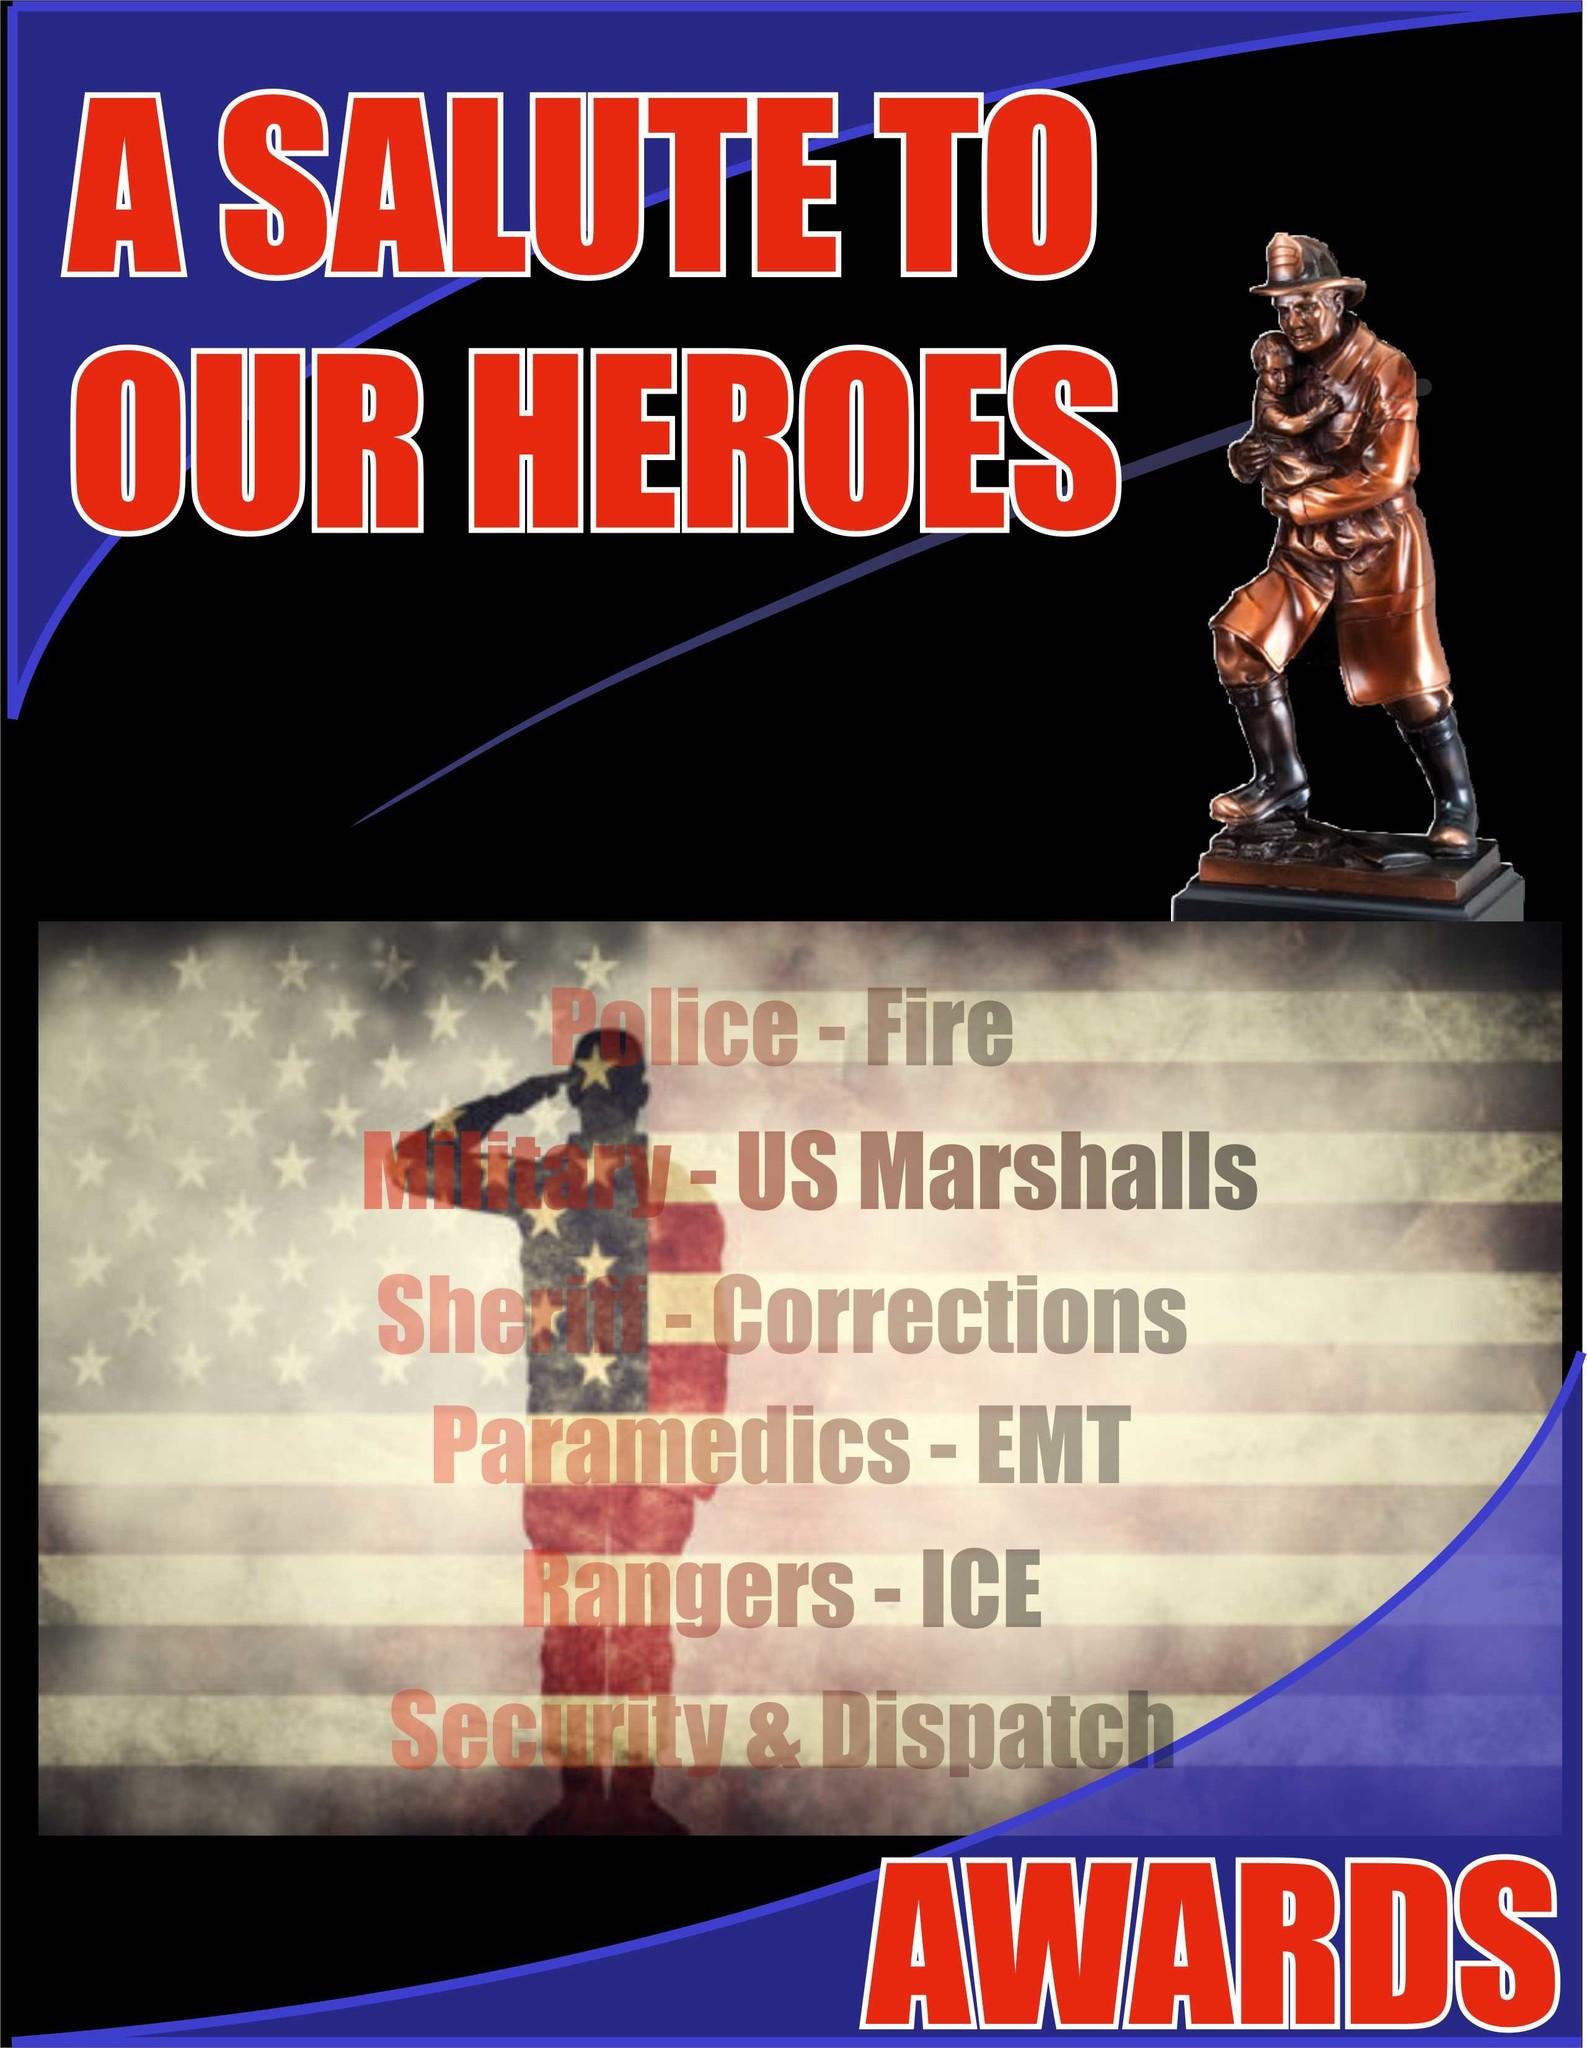 Heroes Awards